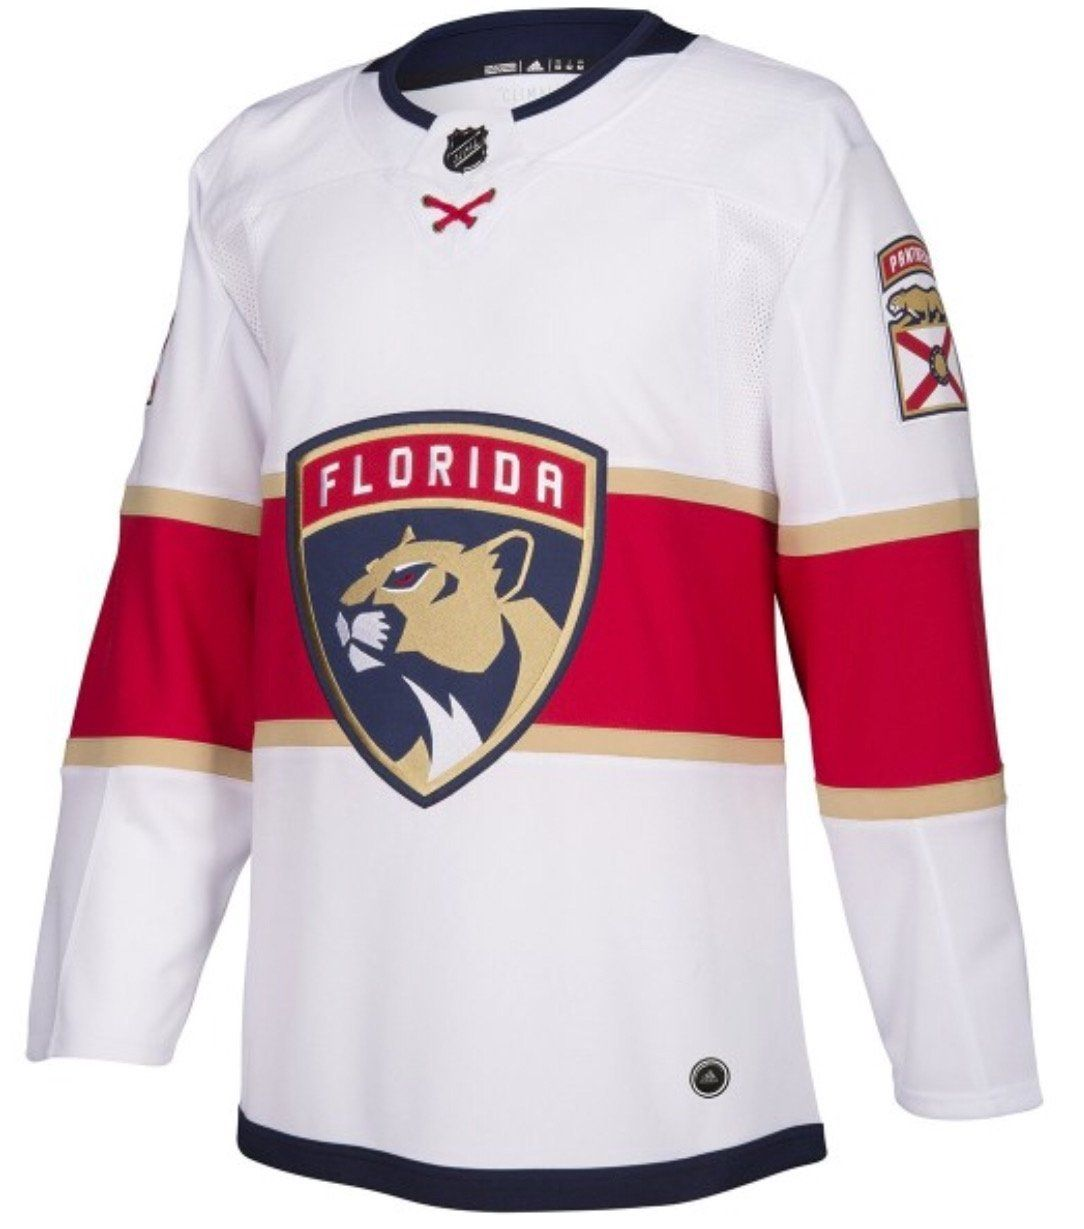 3d5c9ca7 Florida Panthers Premier Adidas NHL Home - Road & Alt Jerseys ...